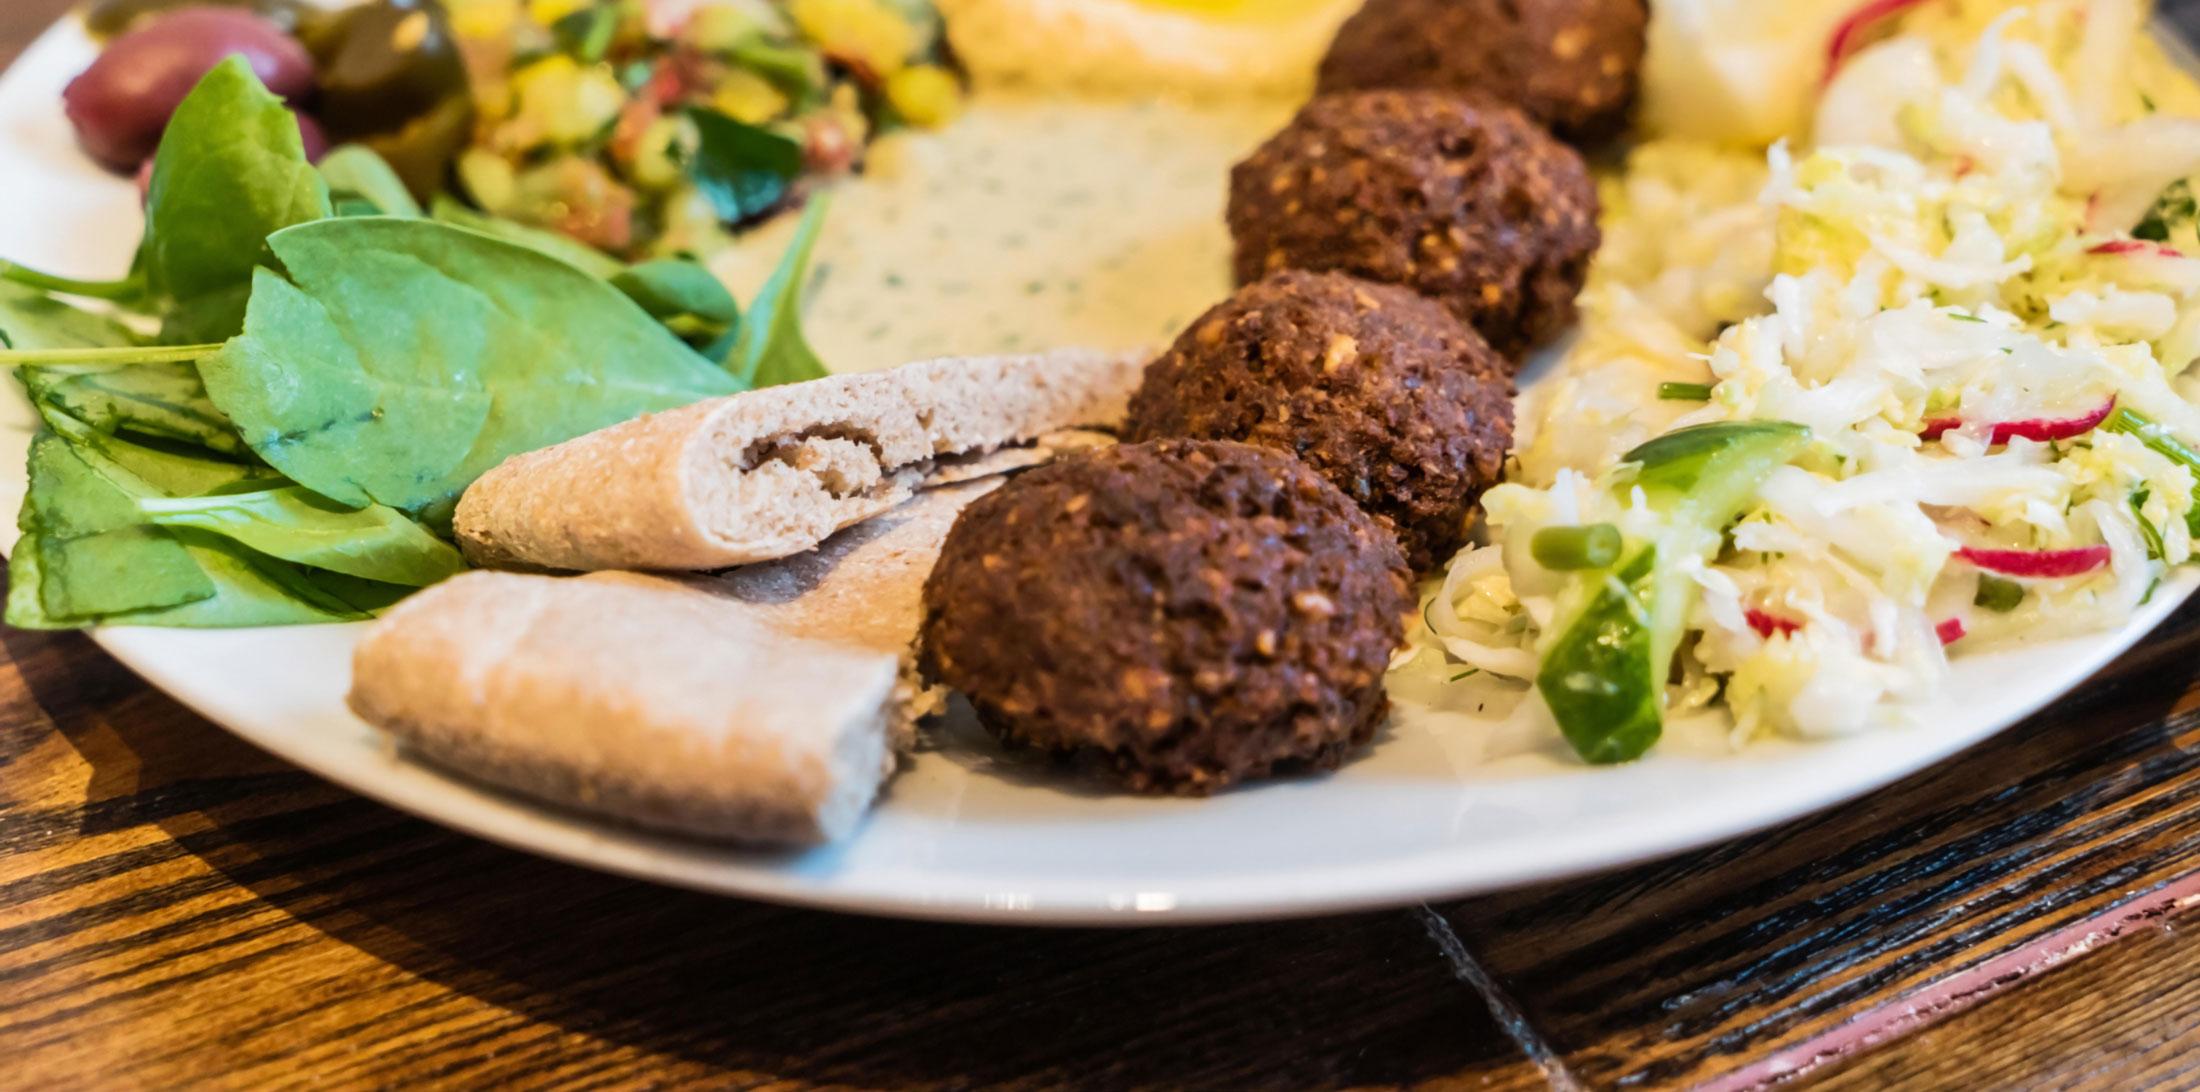 Golan Food elintarvikeliike